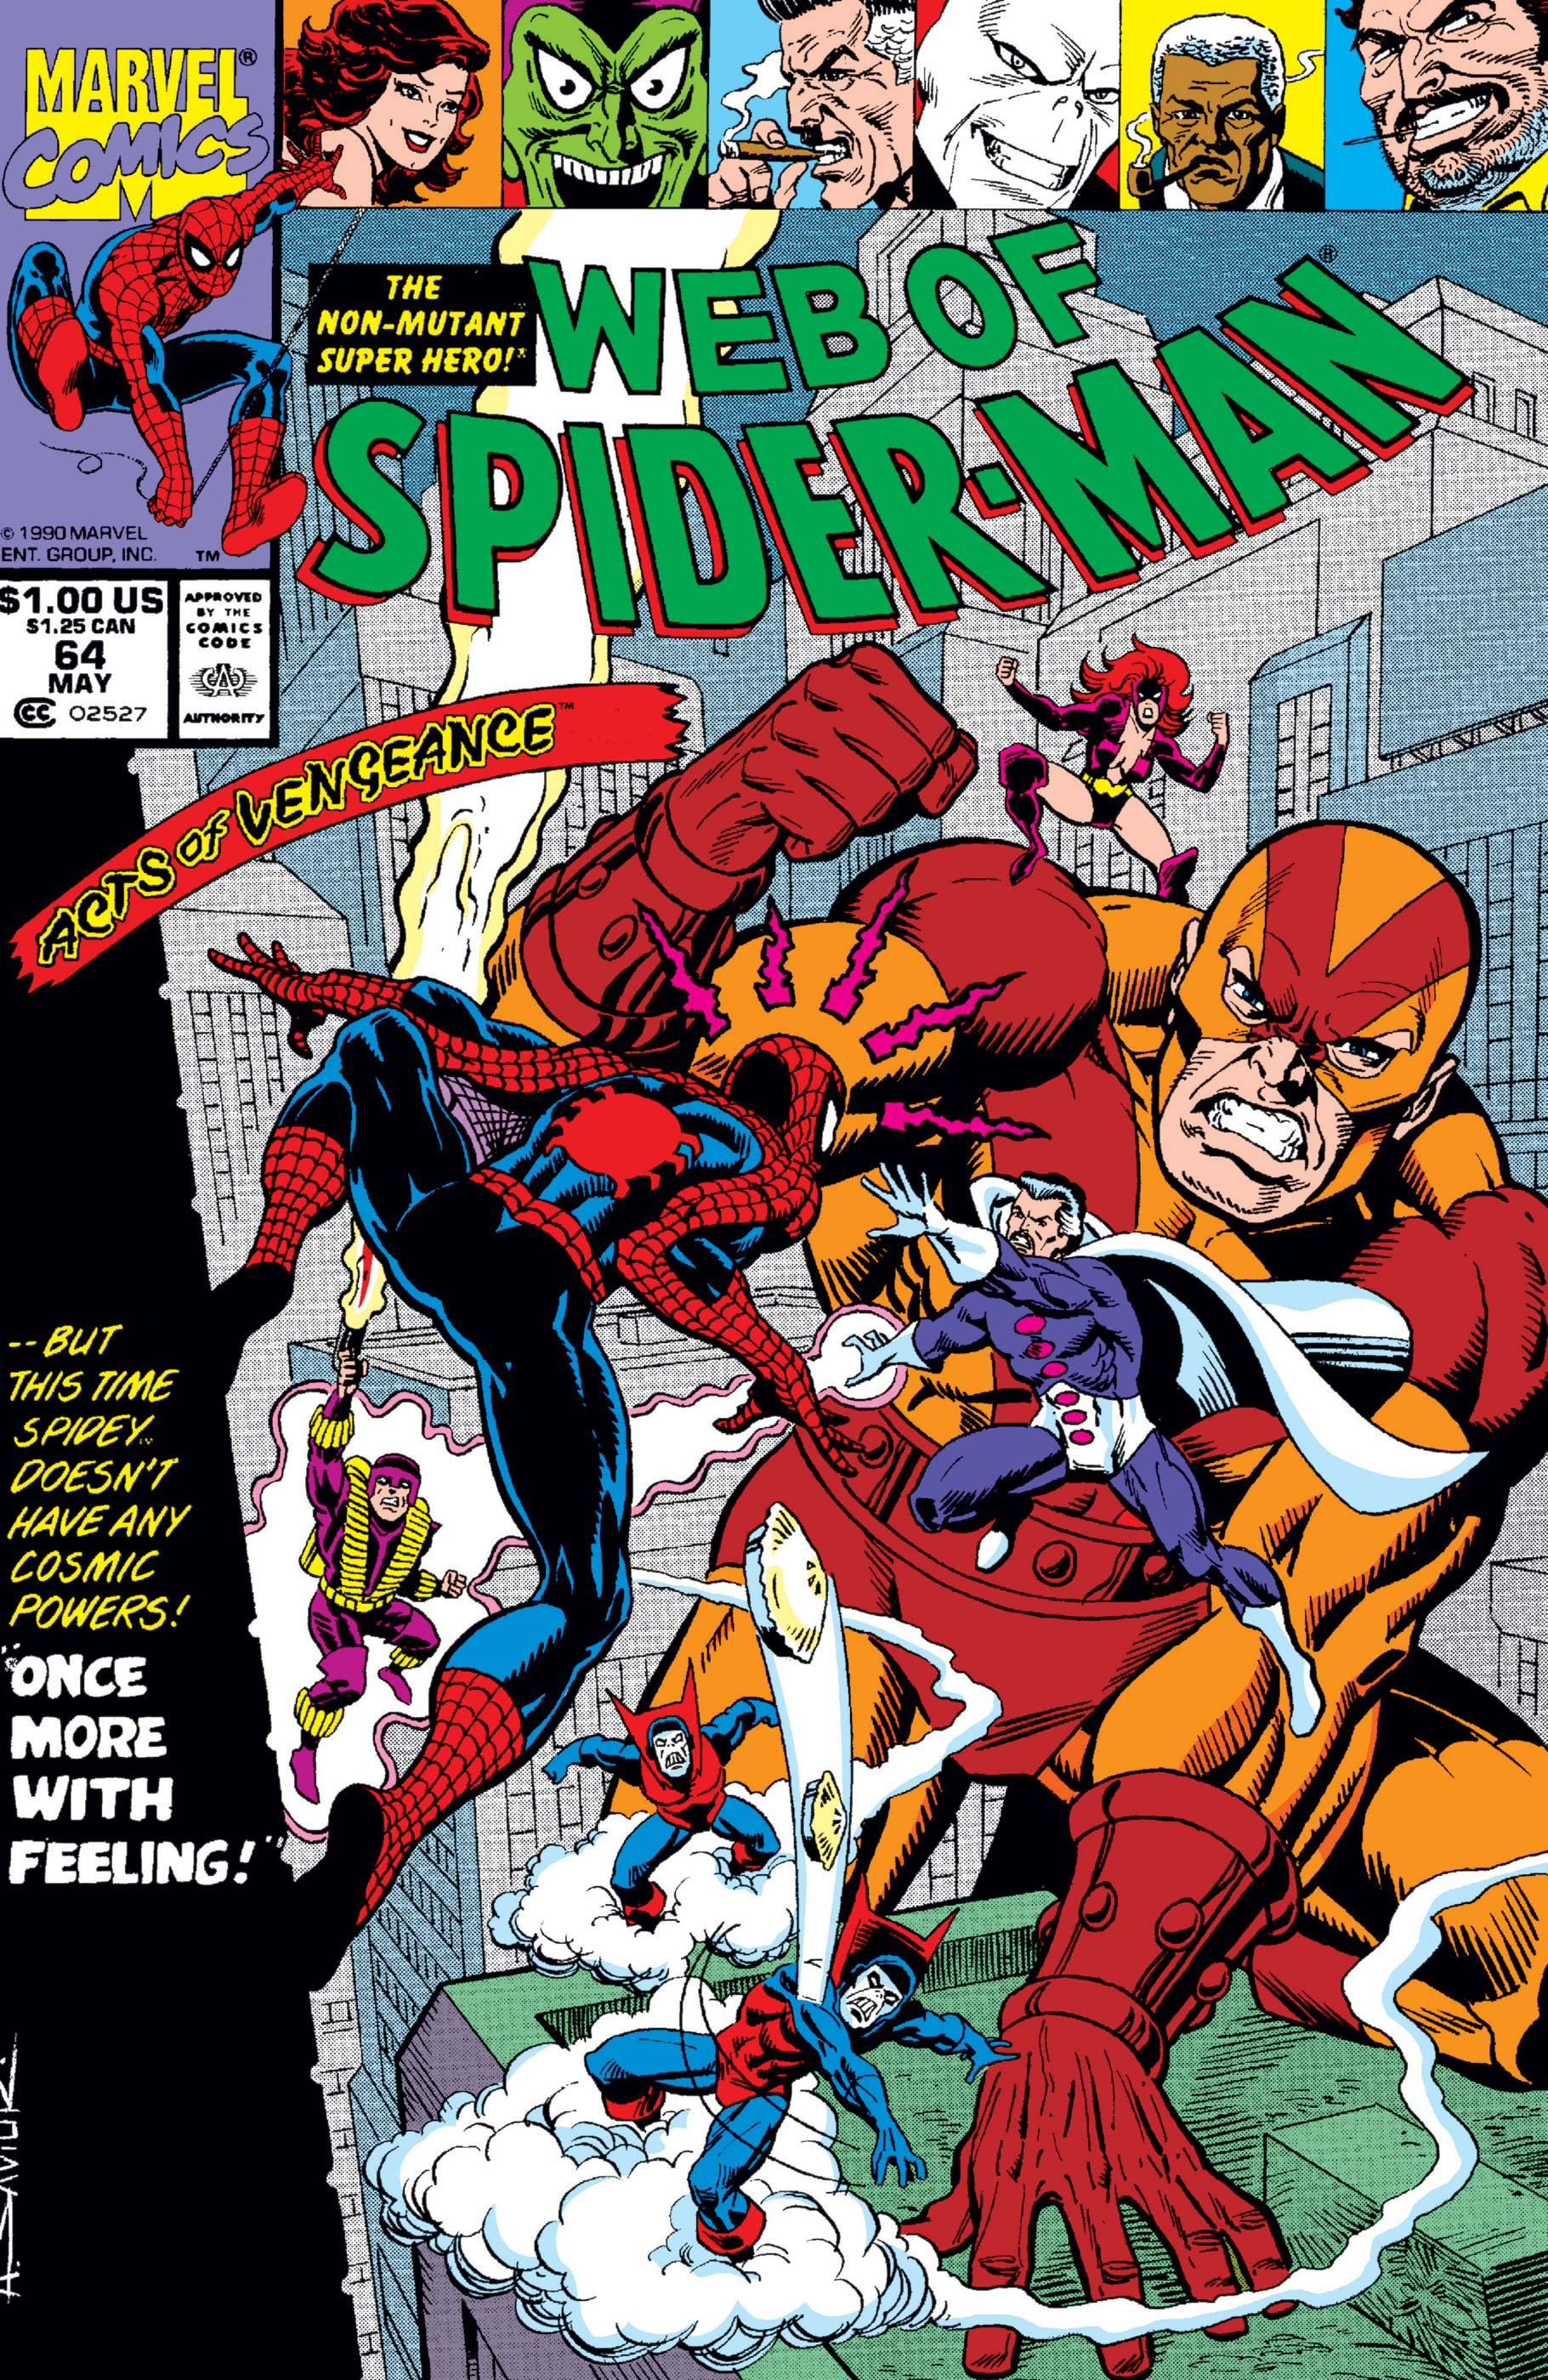 Web of Spider-Man (1985) #64